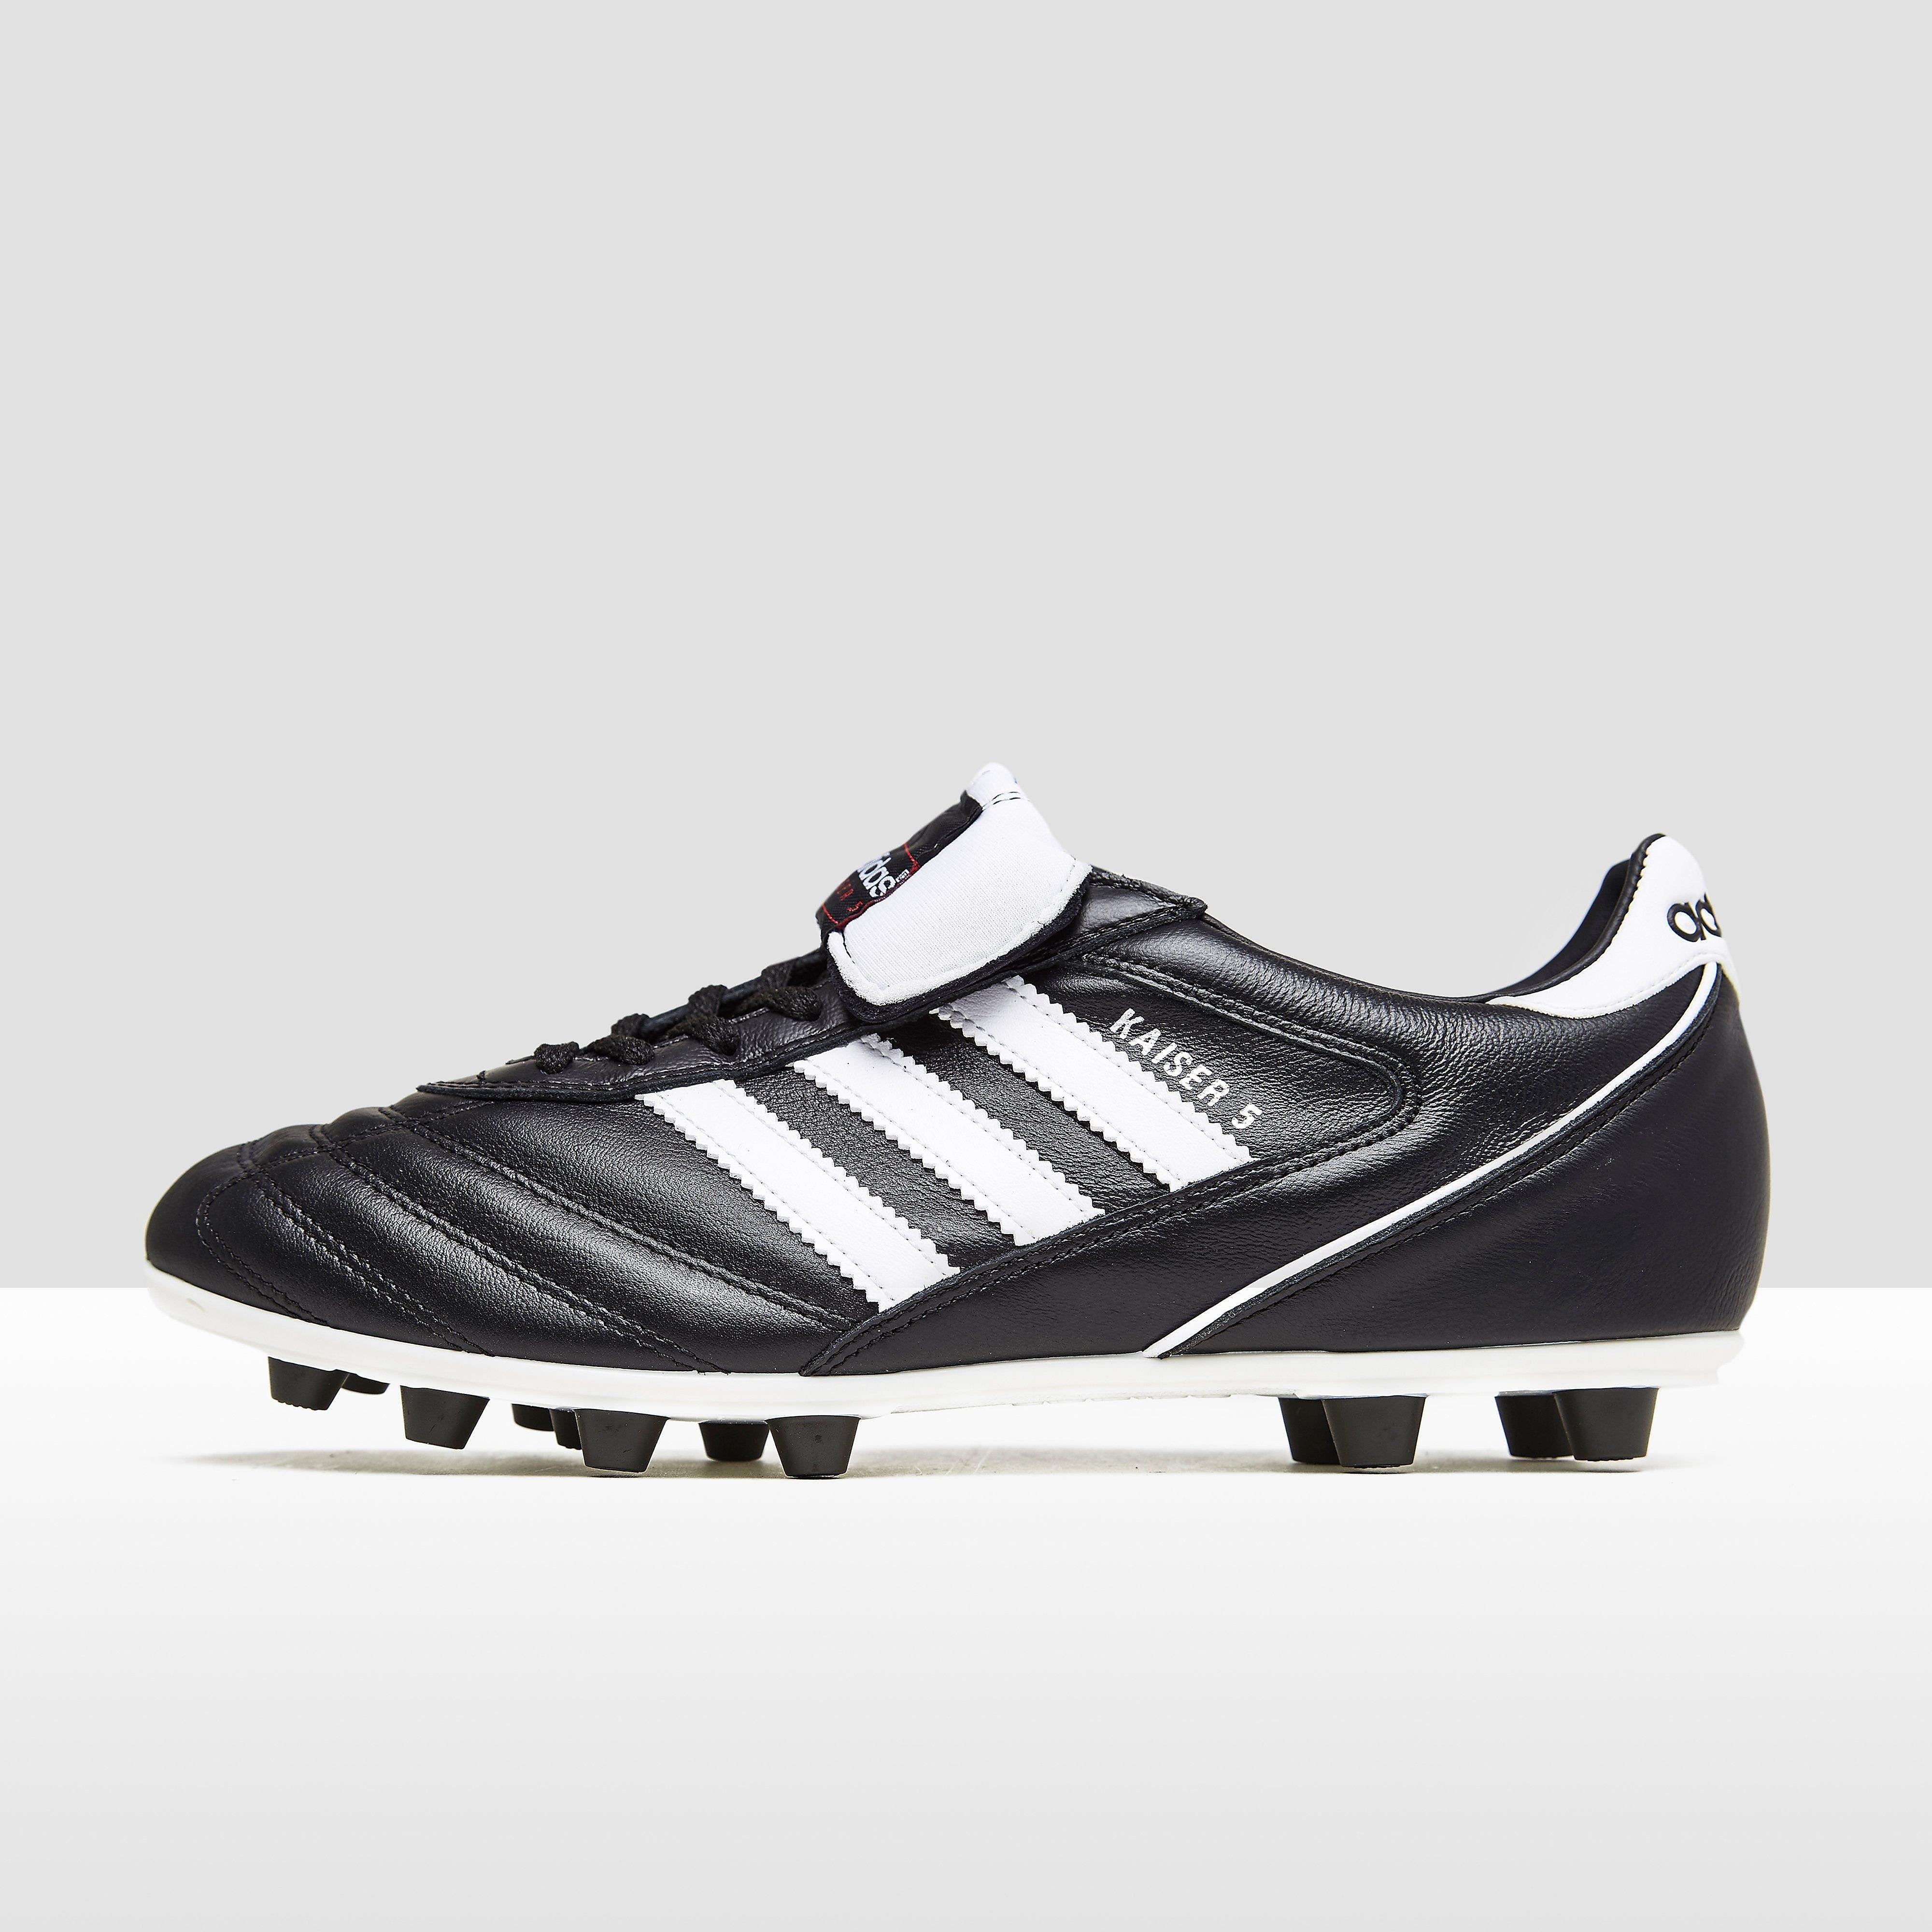 adidas Kaiser 5 liga fg voetbalschoenen zwart Dames